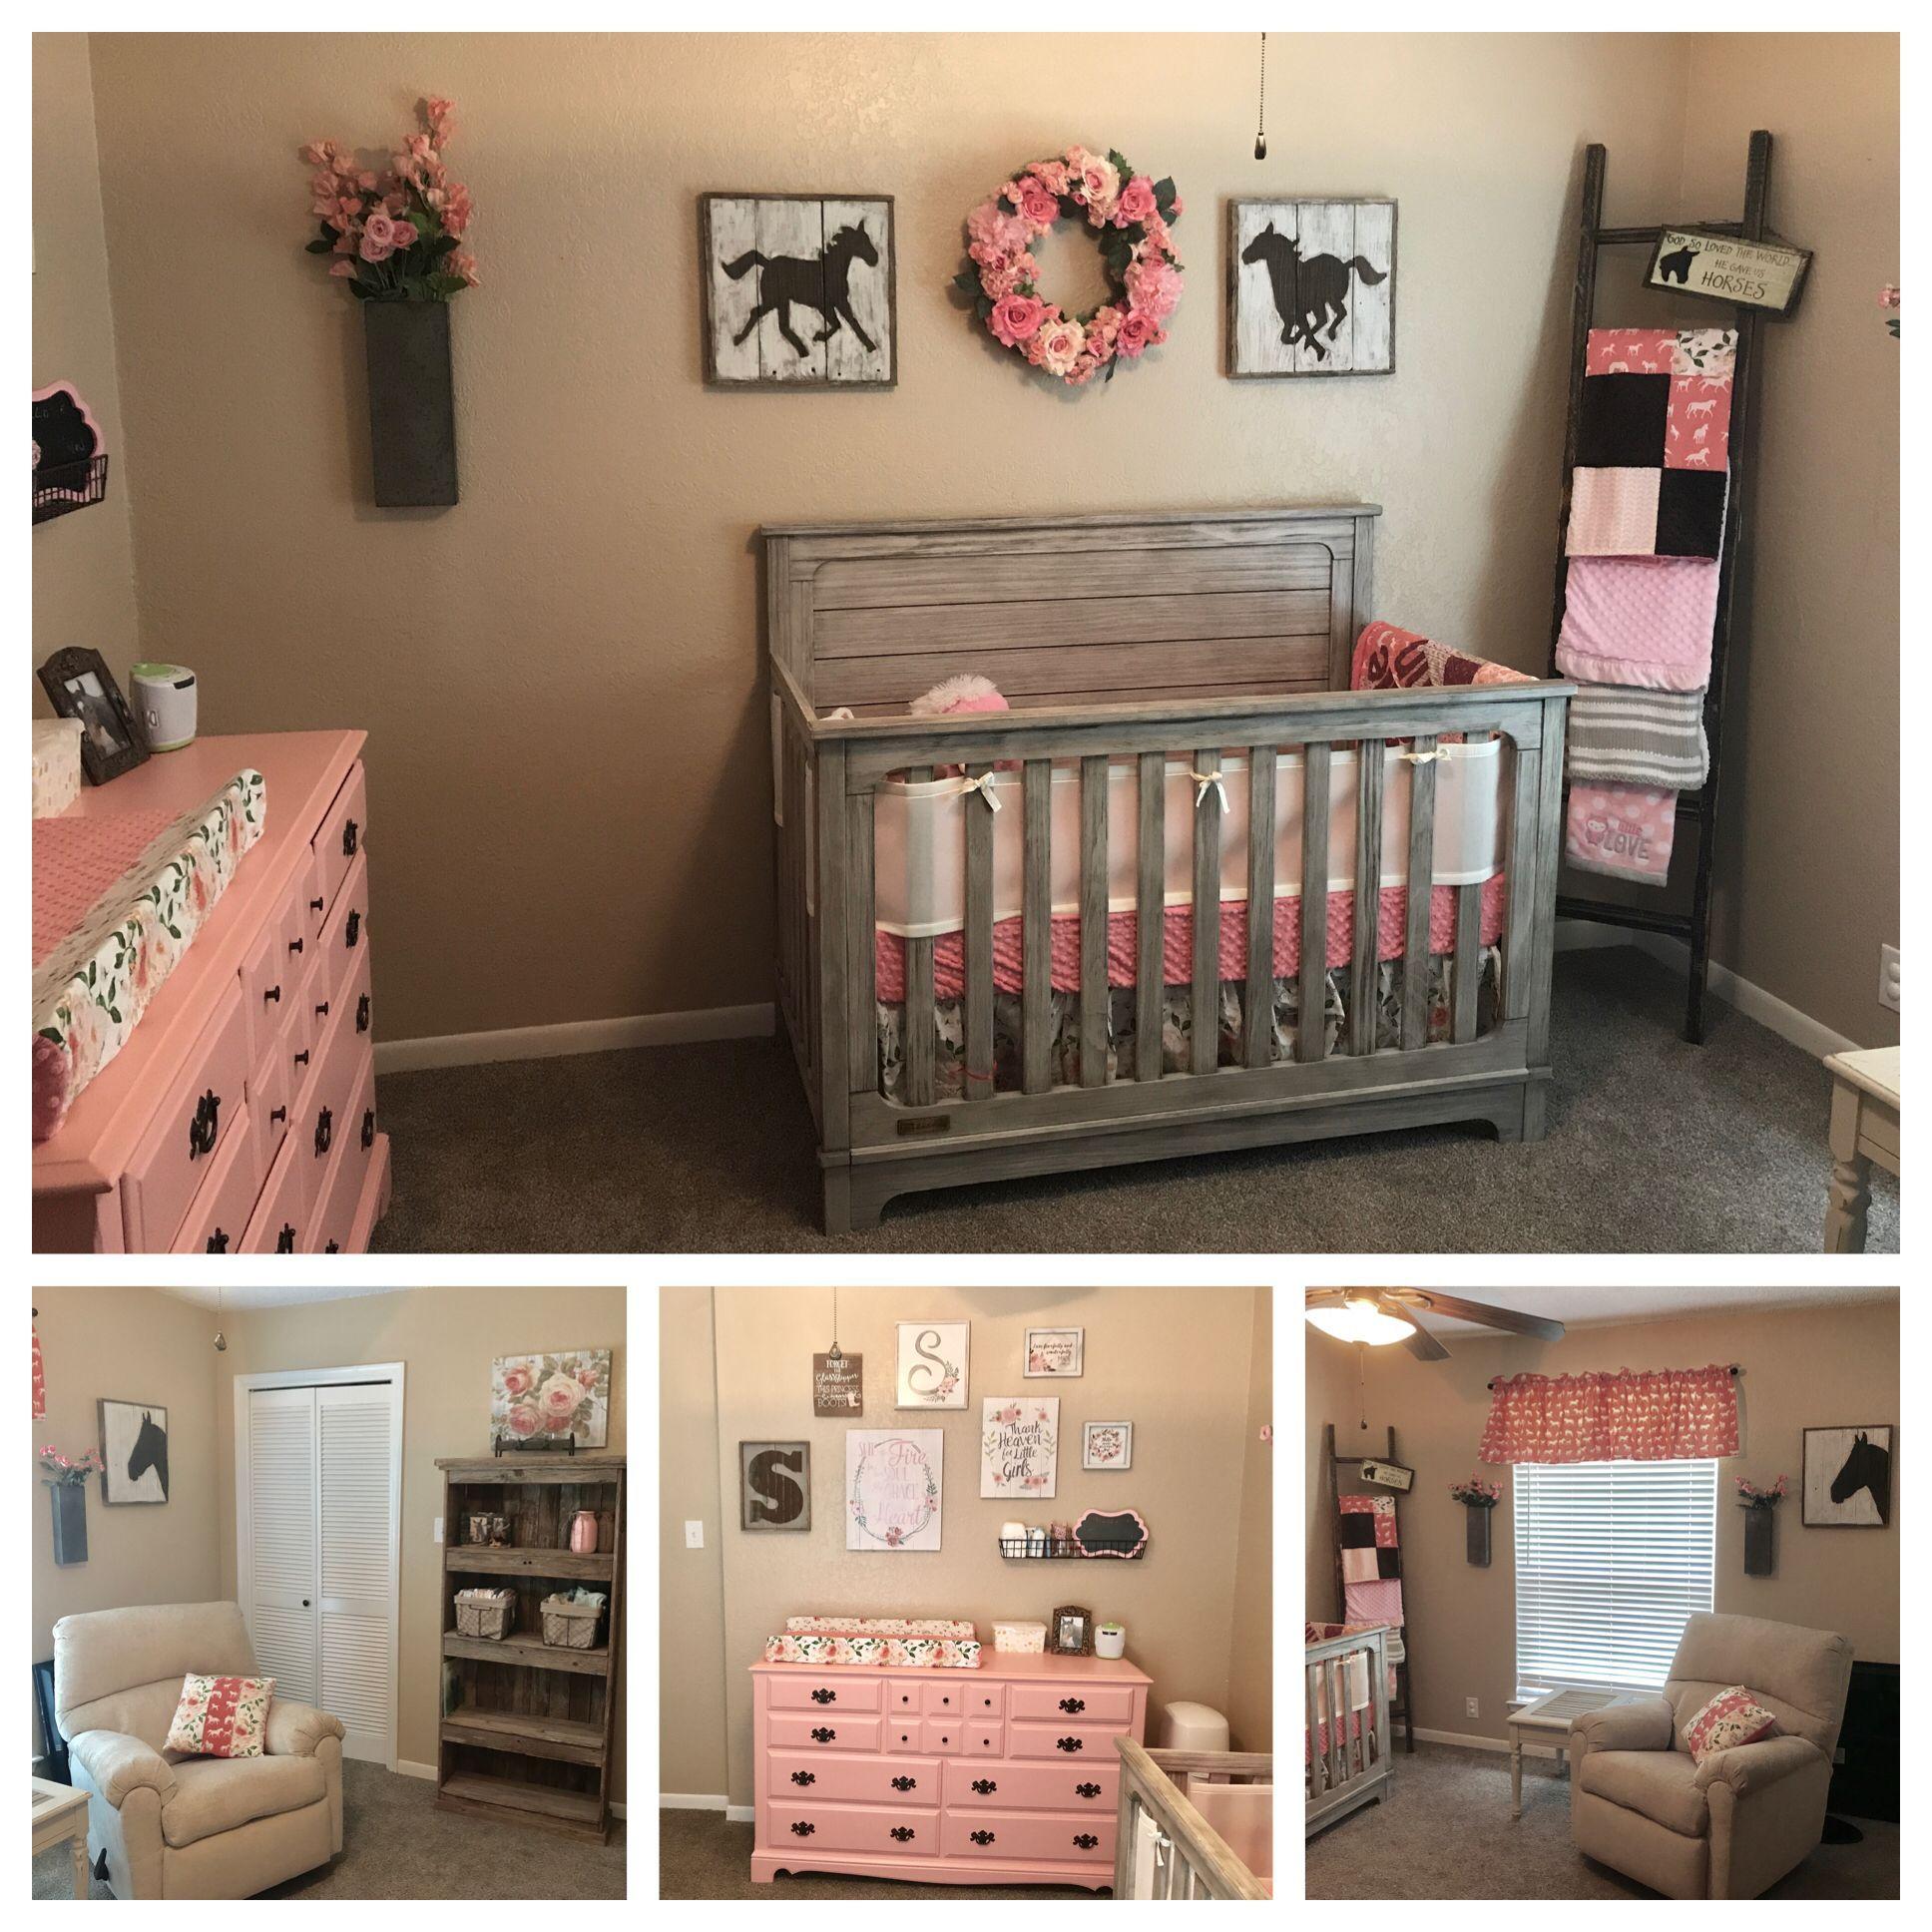 20 Latest Trend Of Cute Baby Girl Room Ideas #Decorideas